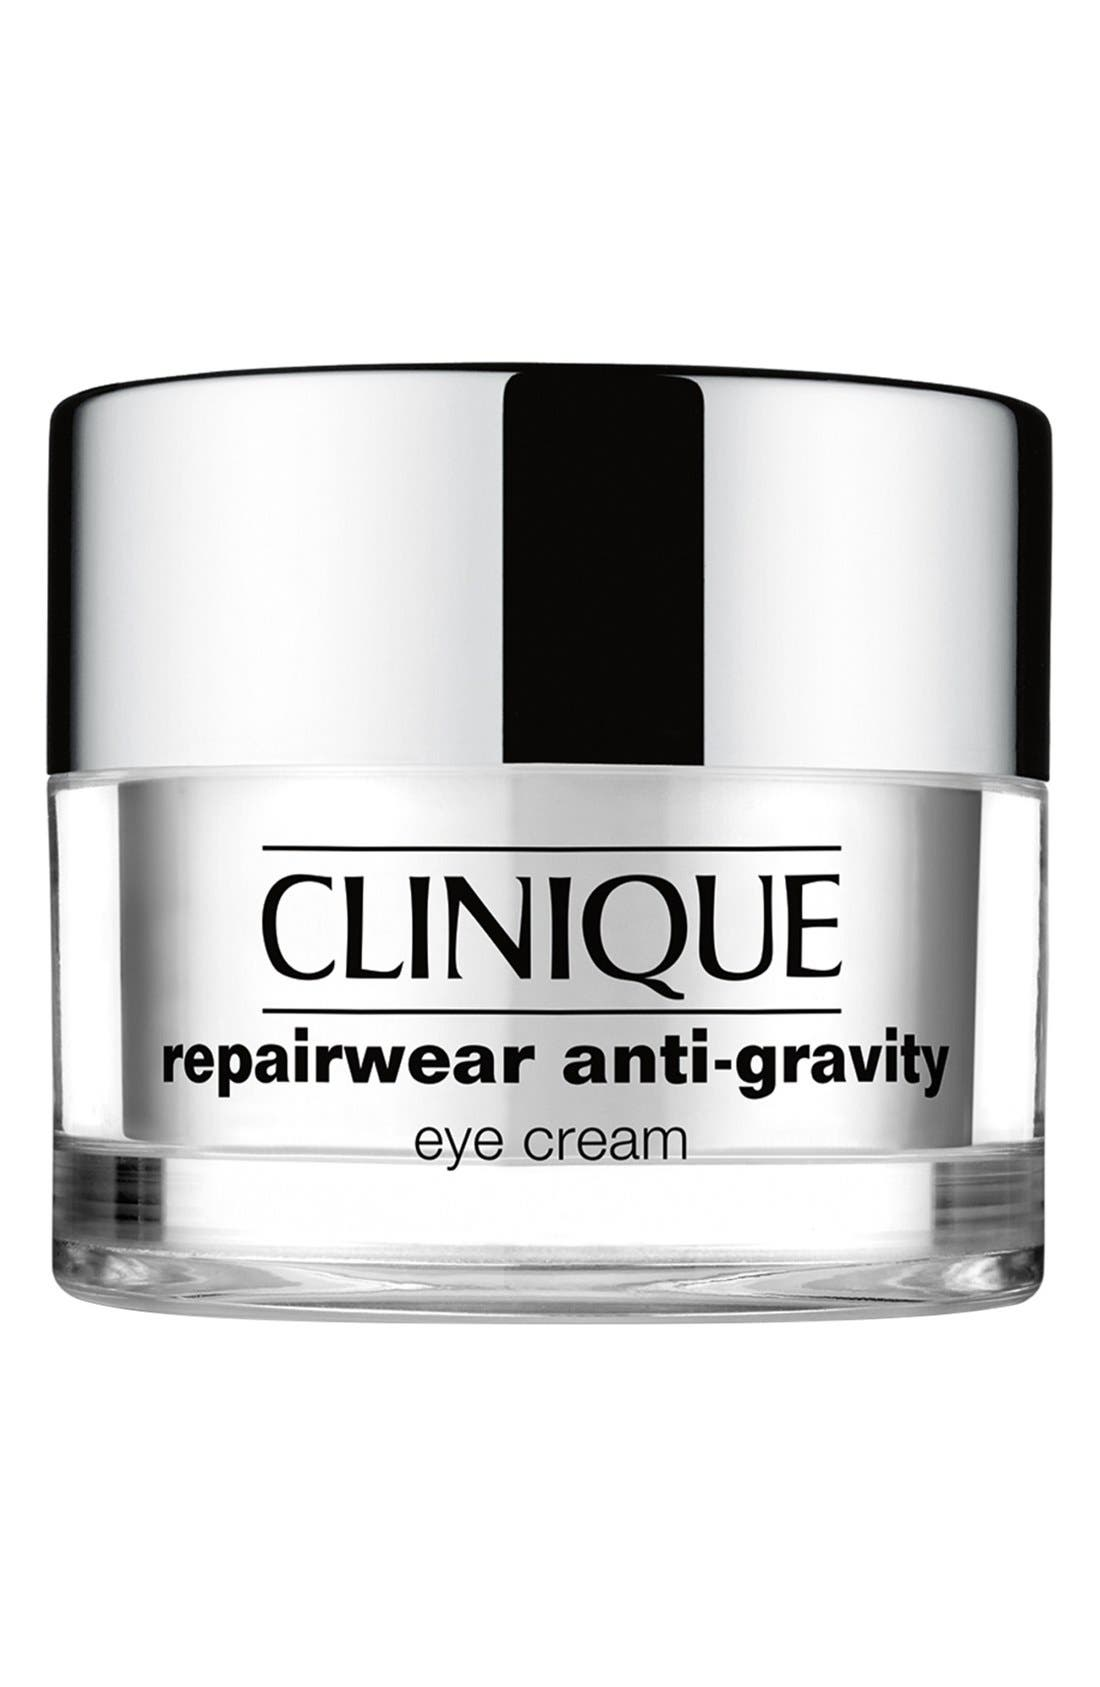 CLINIQUE, Repairwear Anti-Gravity Eye Cream, Main thumbnail 1, color, NO COLOR